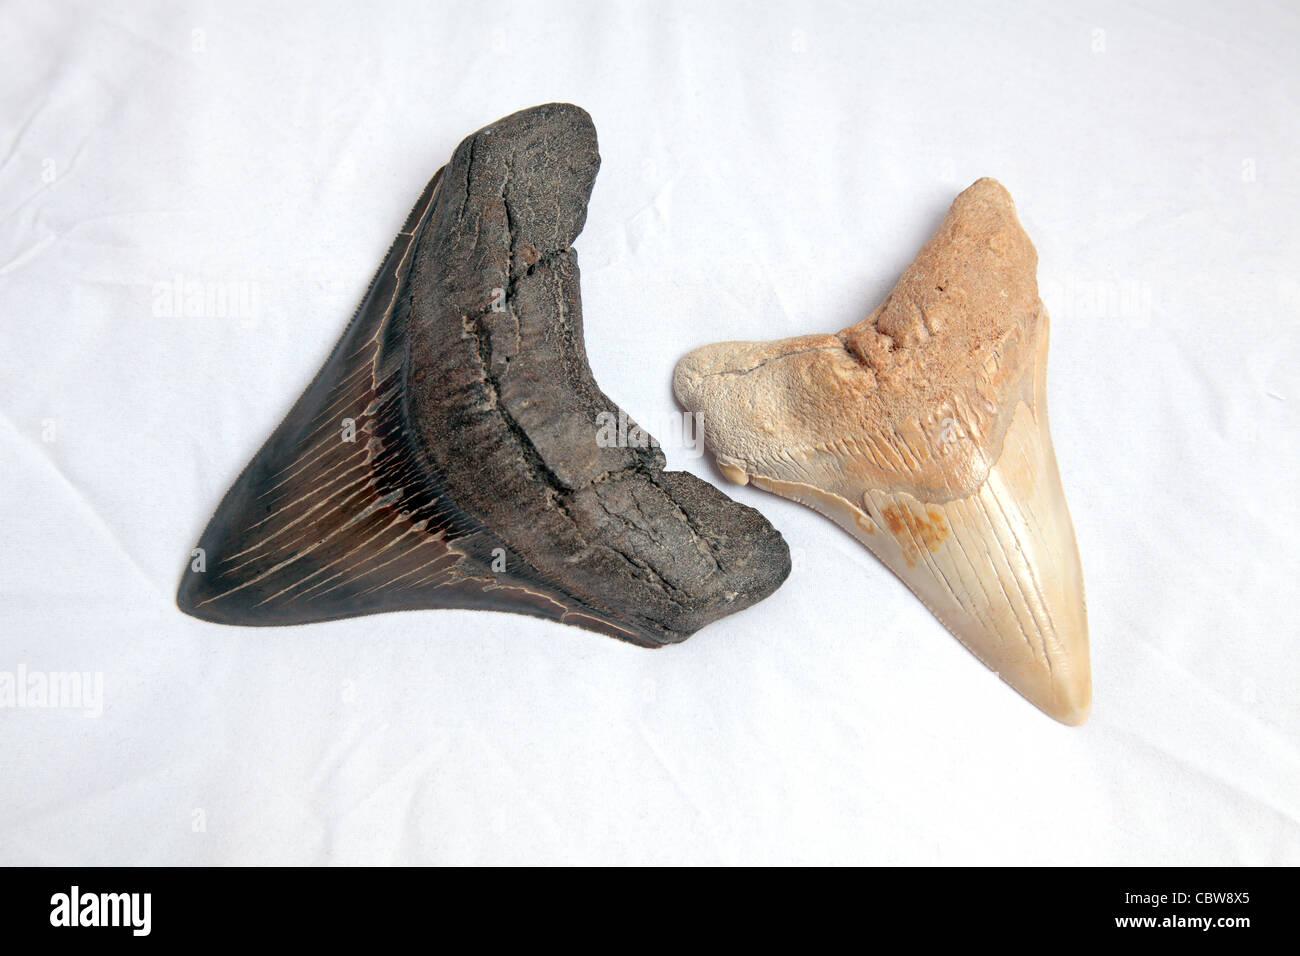 Megalodon shark teeth fossil - Stock Image